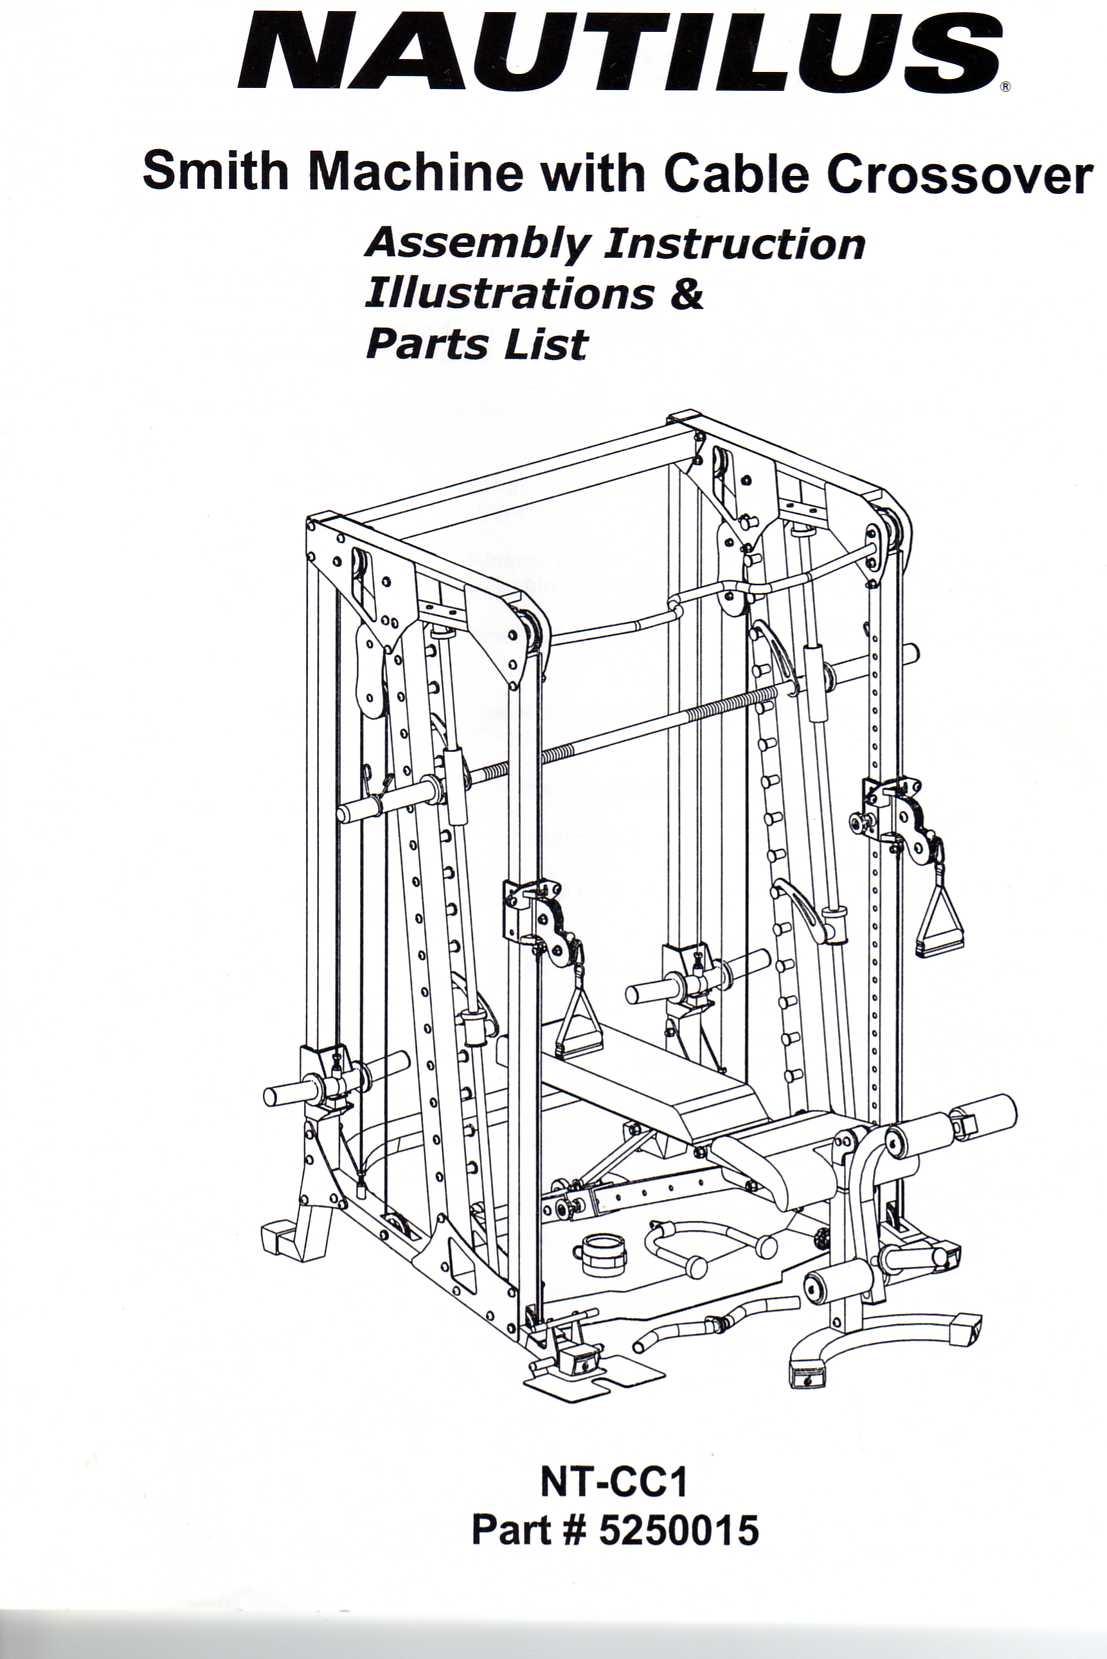 Nautilus NT-CC1 Assembly Manual